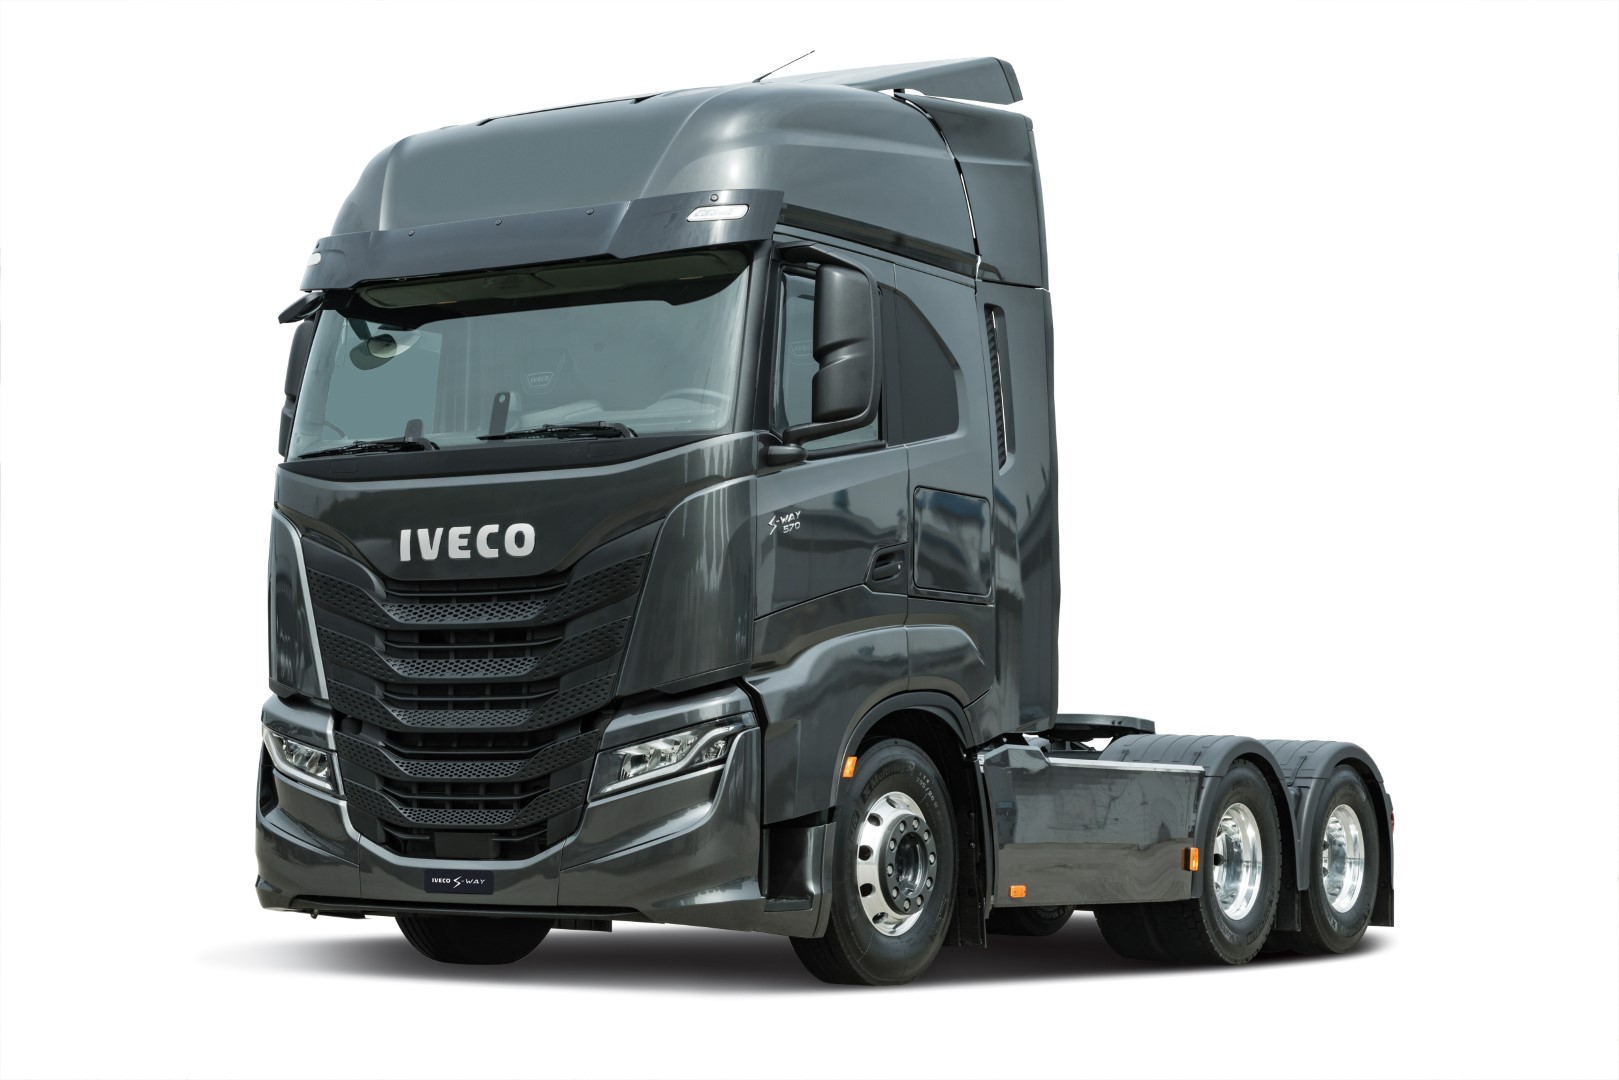 2021 Iveco S-Way